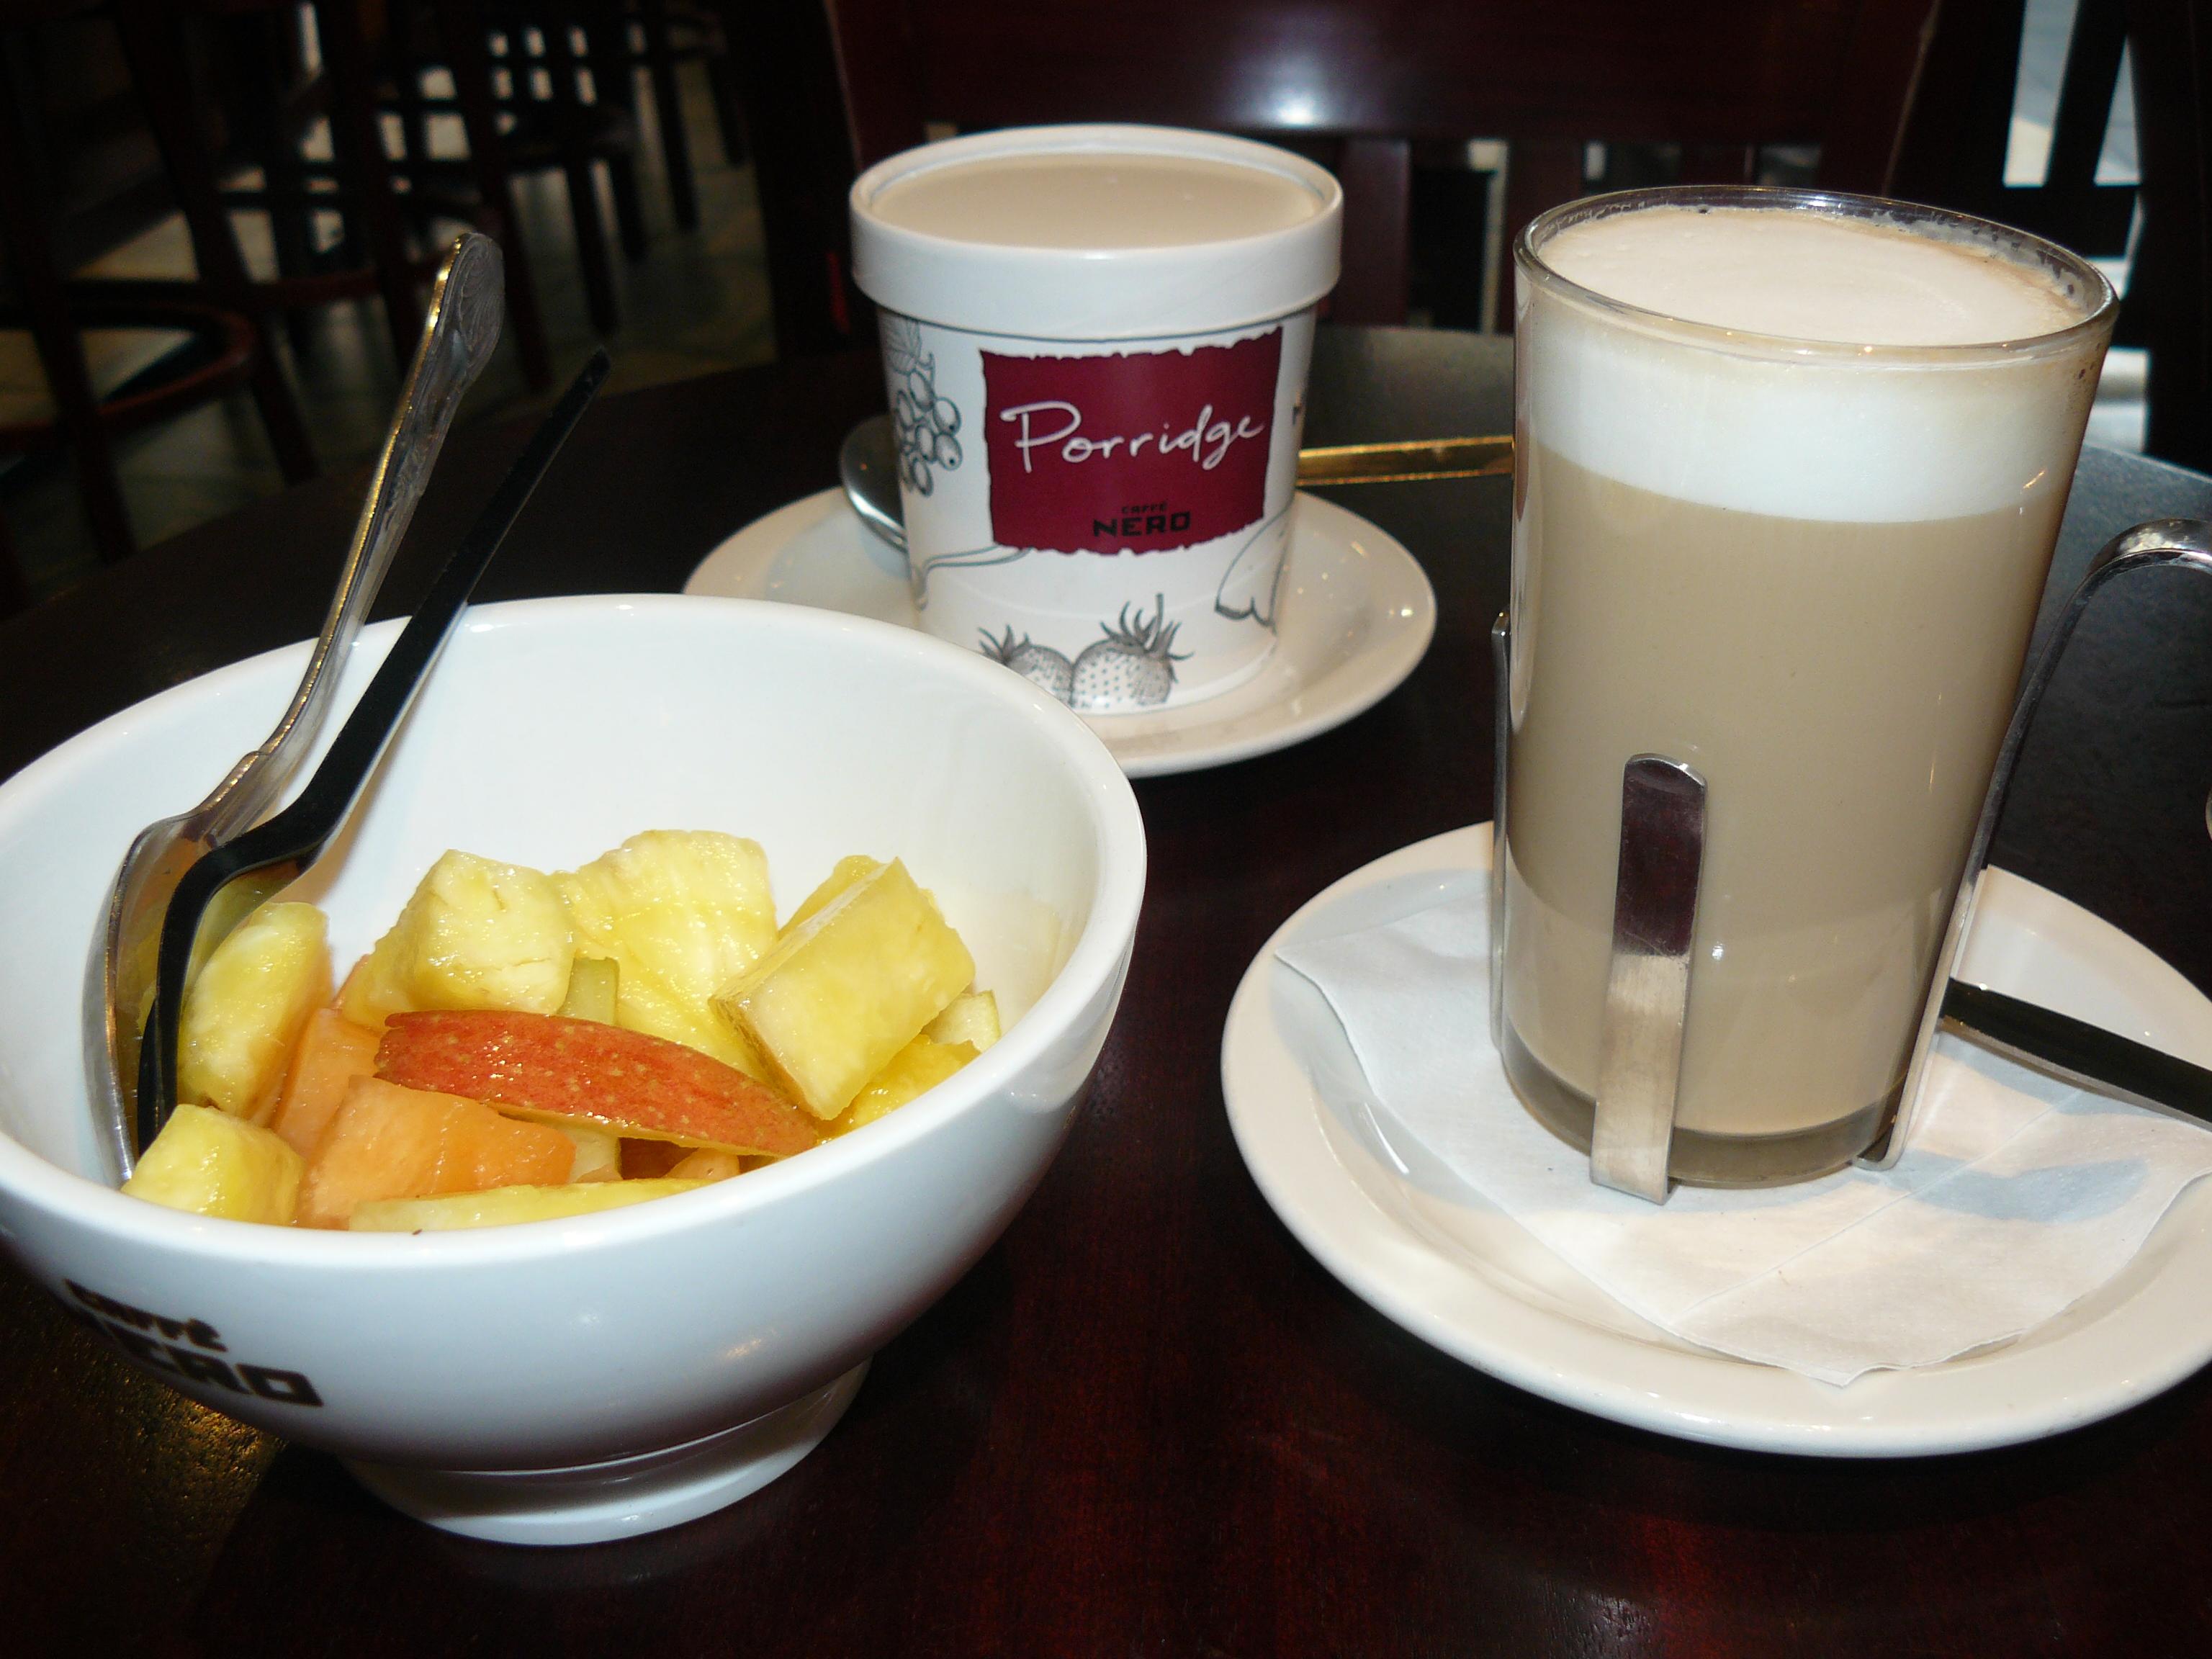 Neron porridge